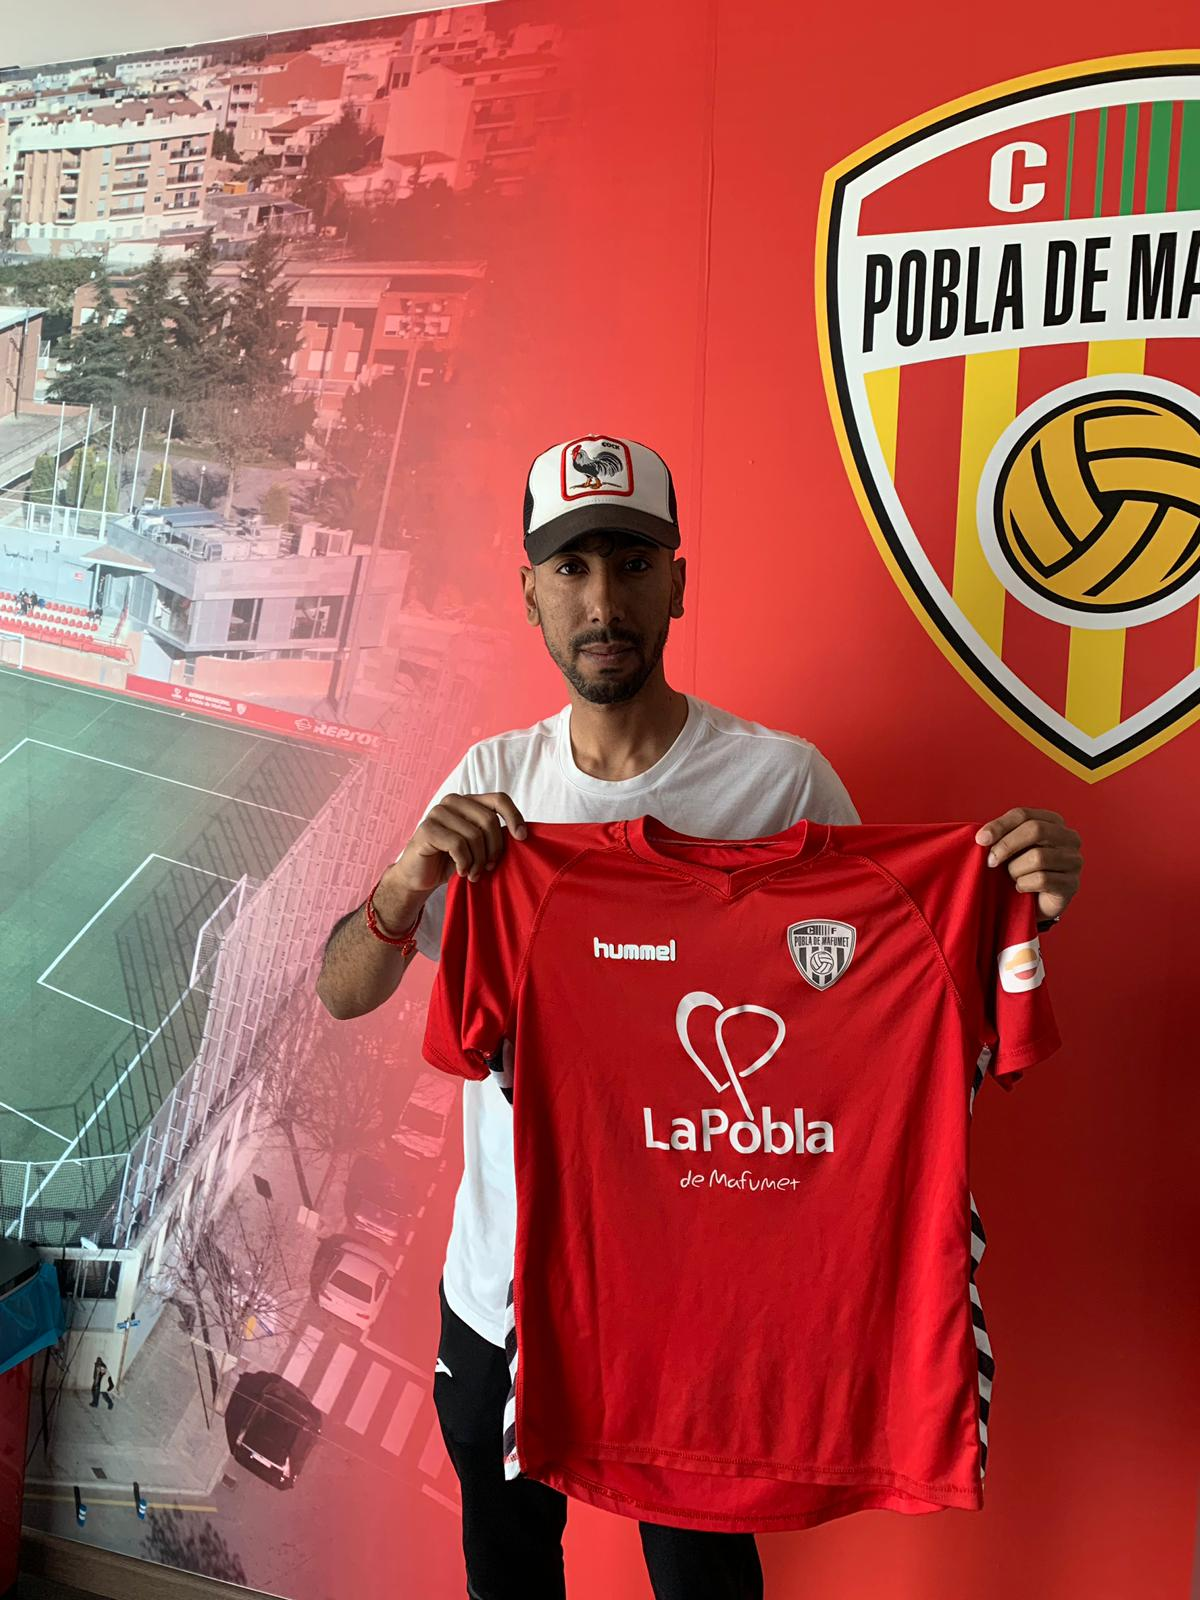 La Pobla B fitxa al davanter Mohamed Harouda